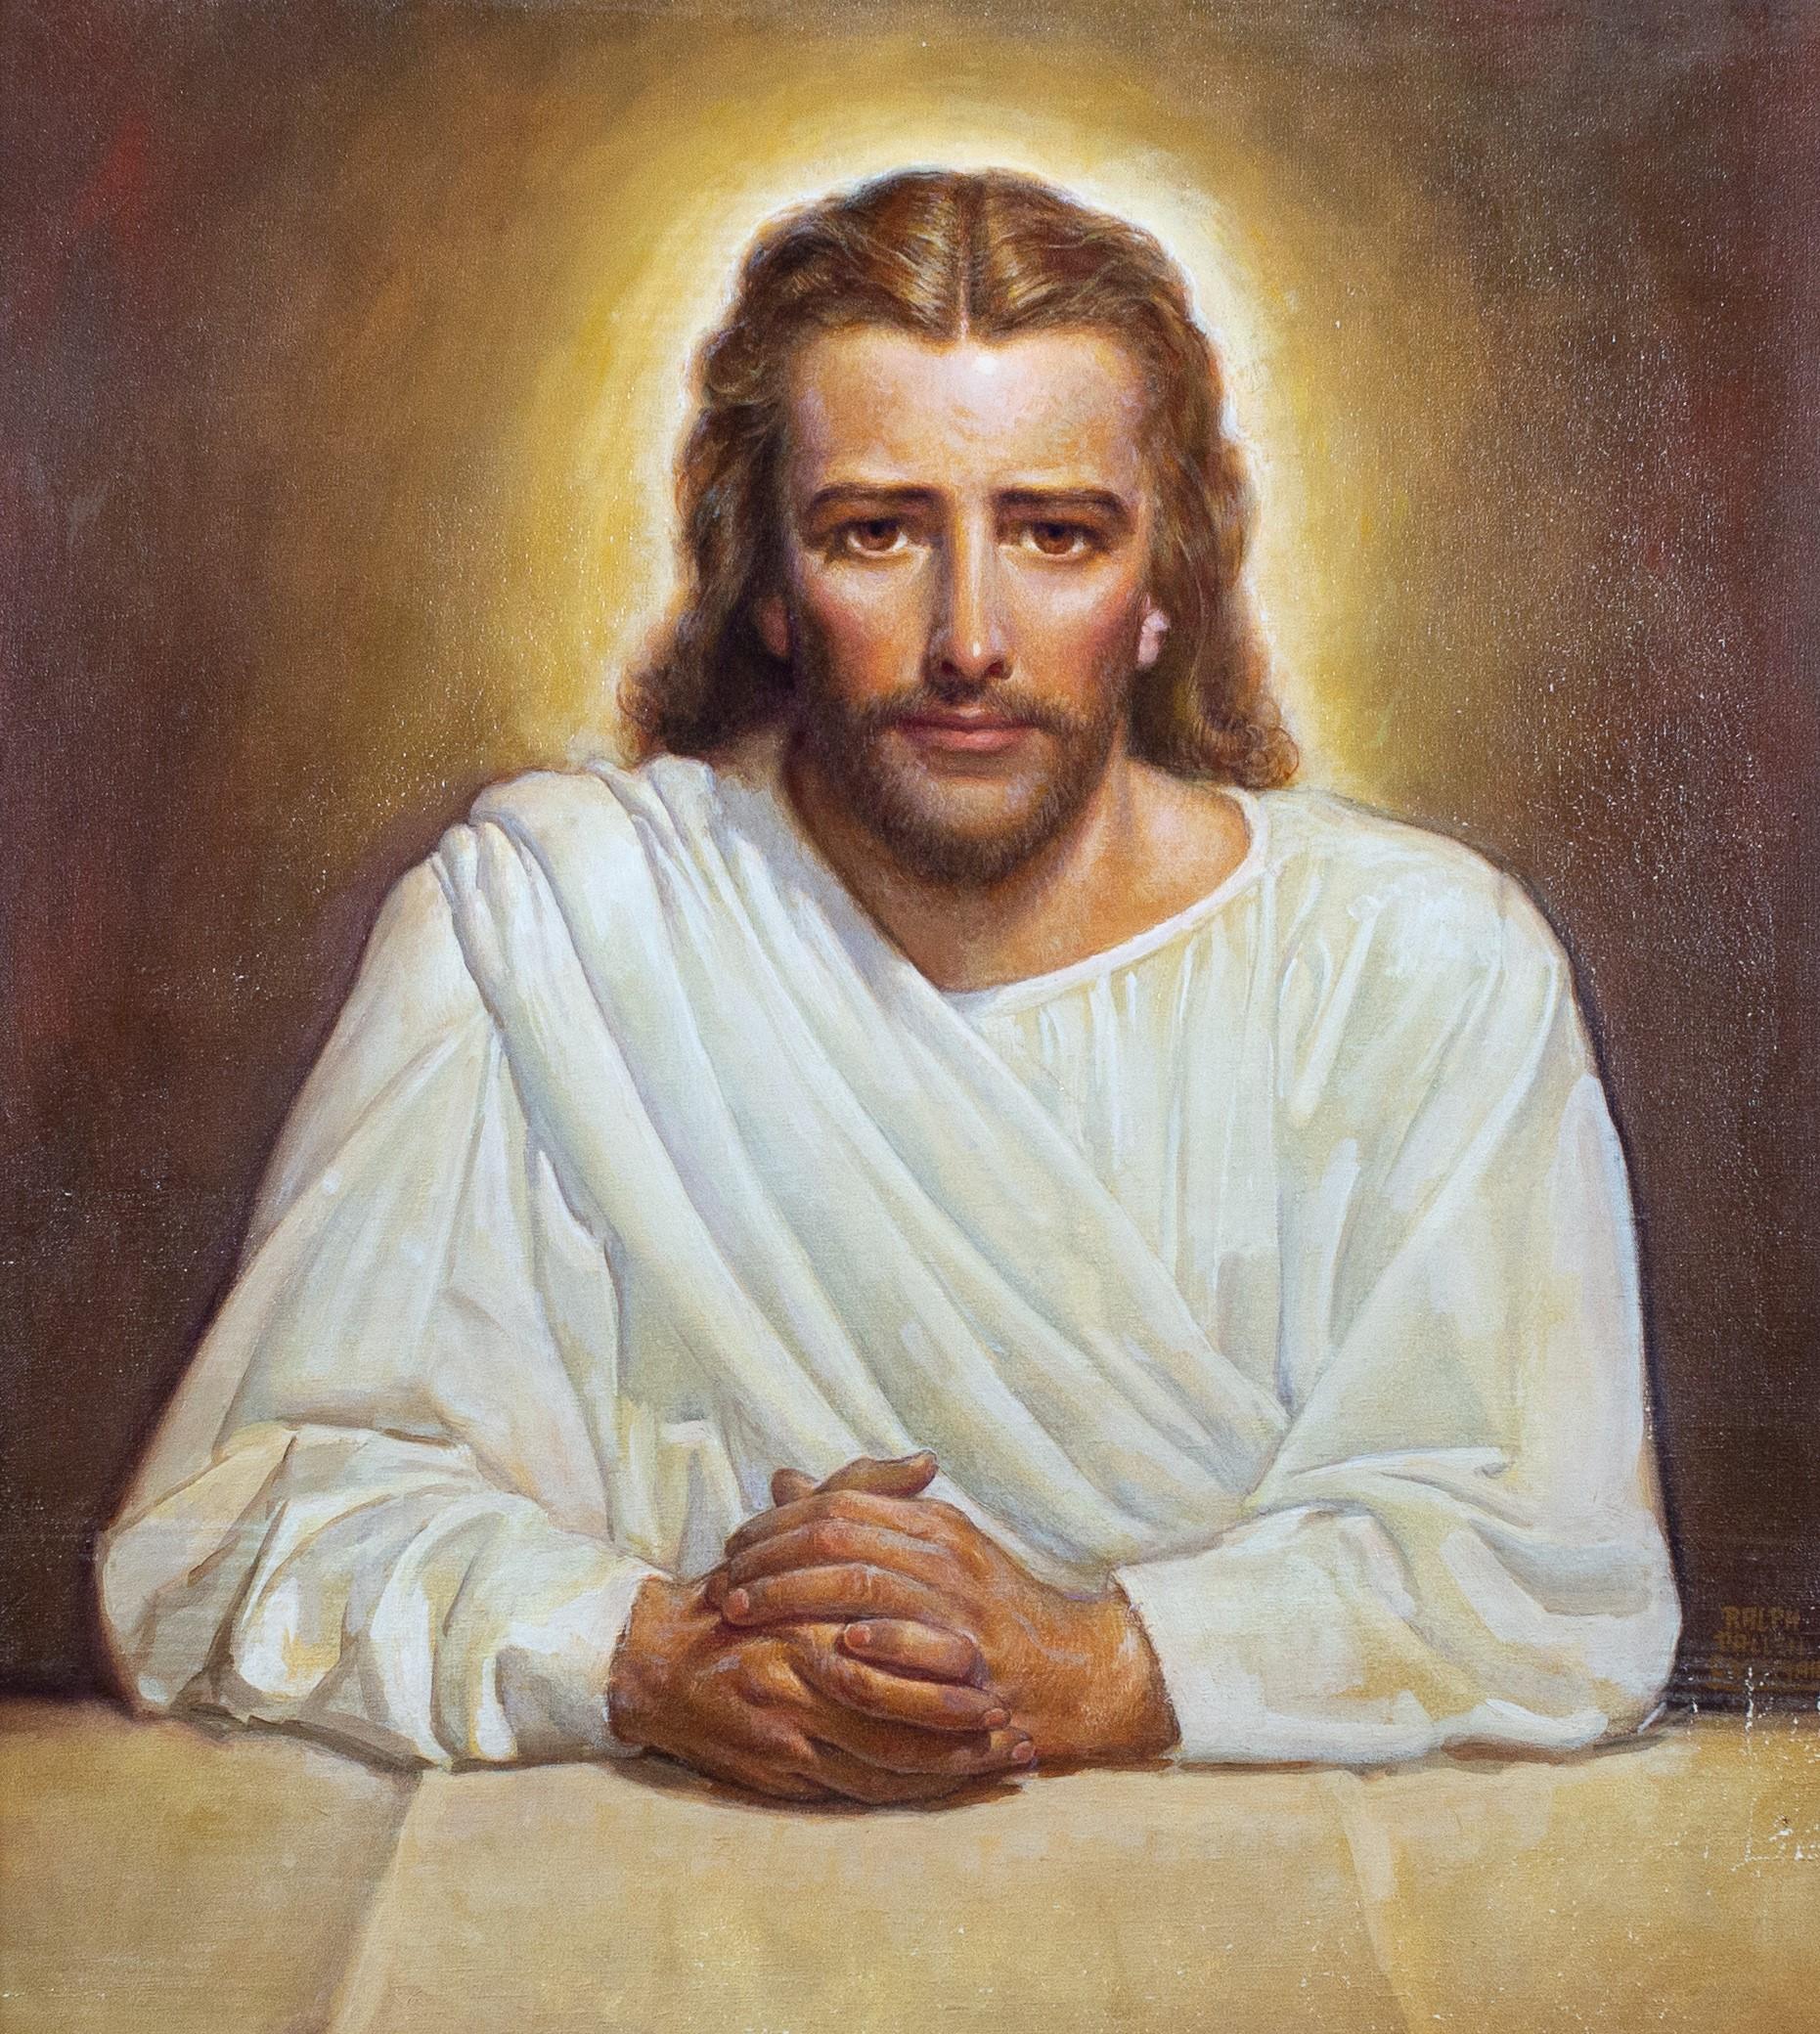 The Savior Christian Illustration by Ralph Pallen Coleman